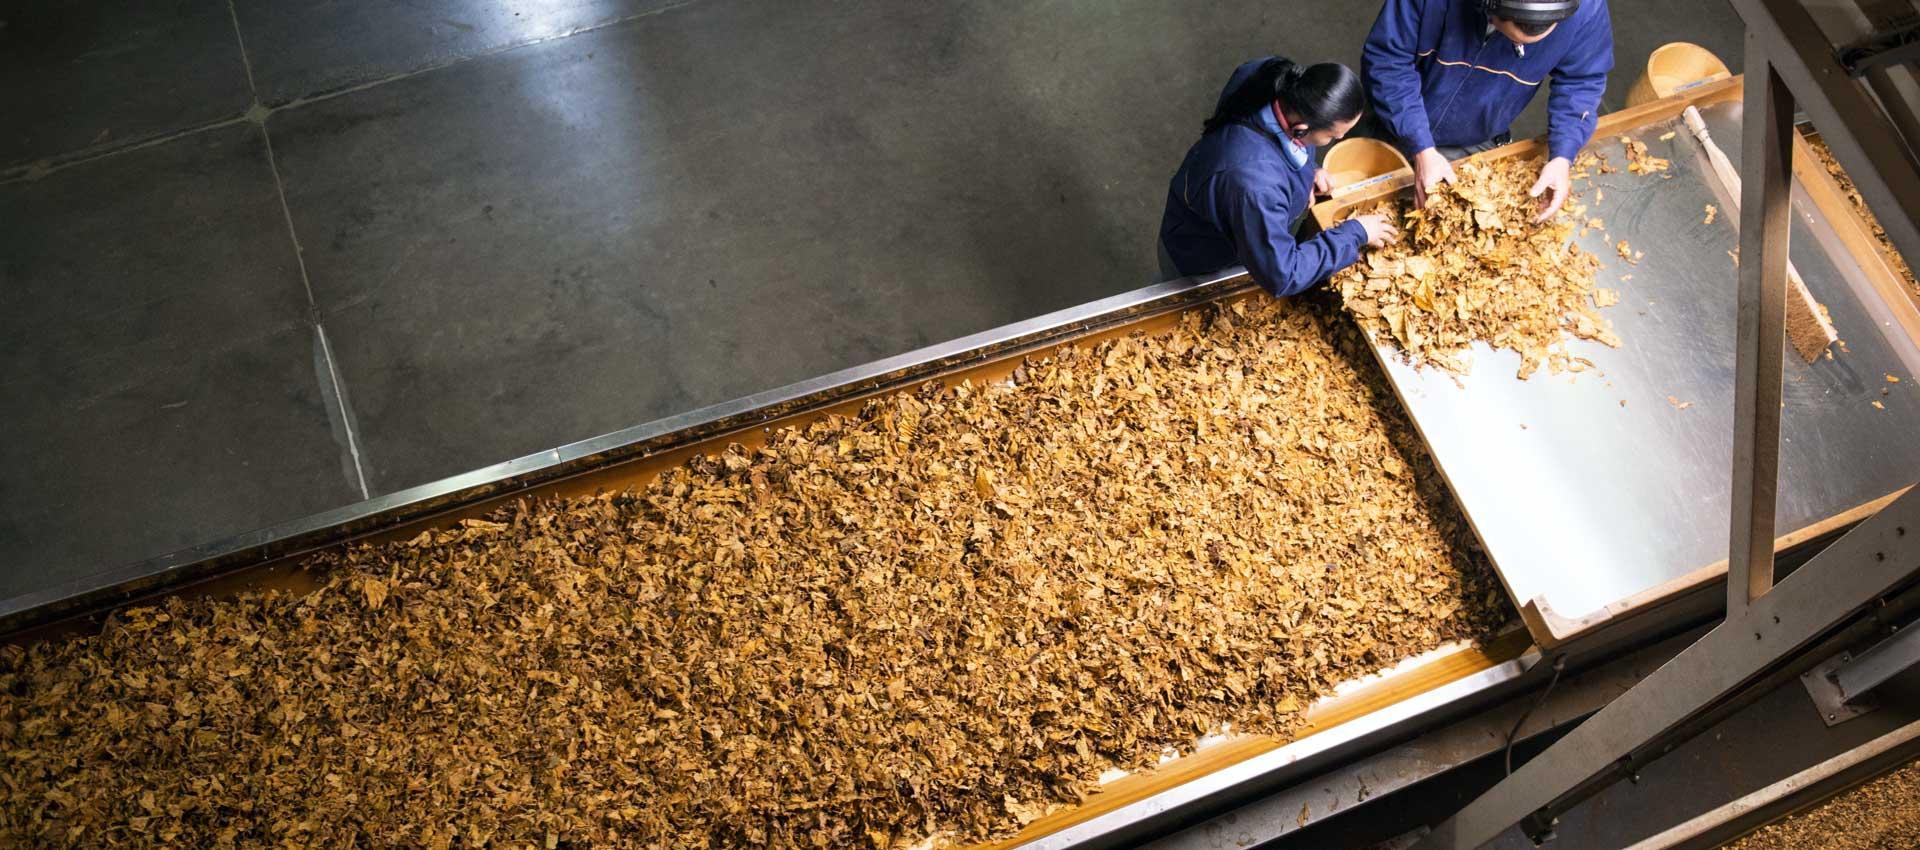 Gulf Tobacco Processing Line